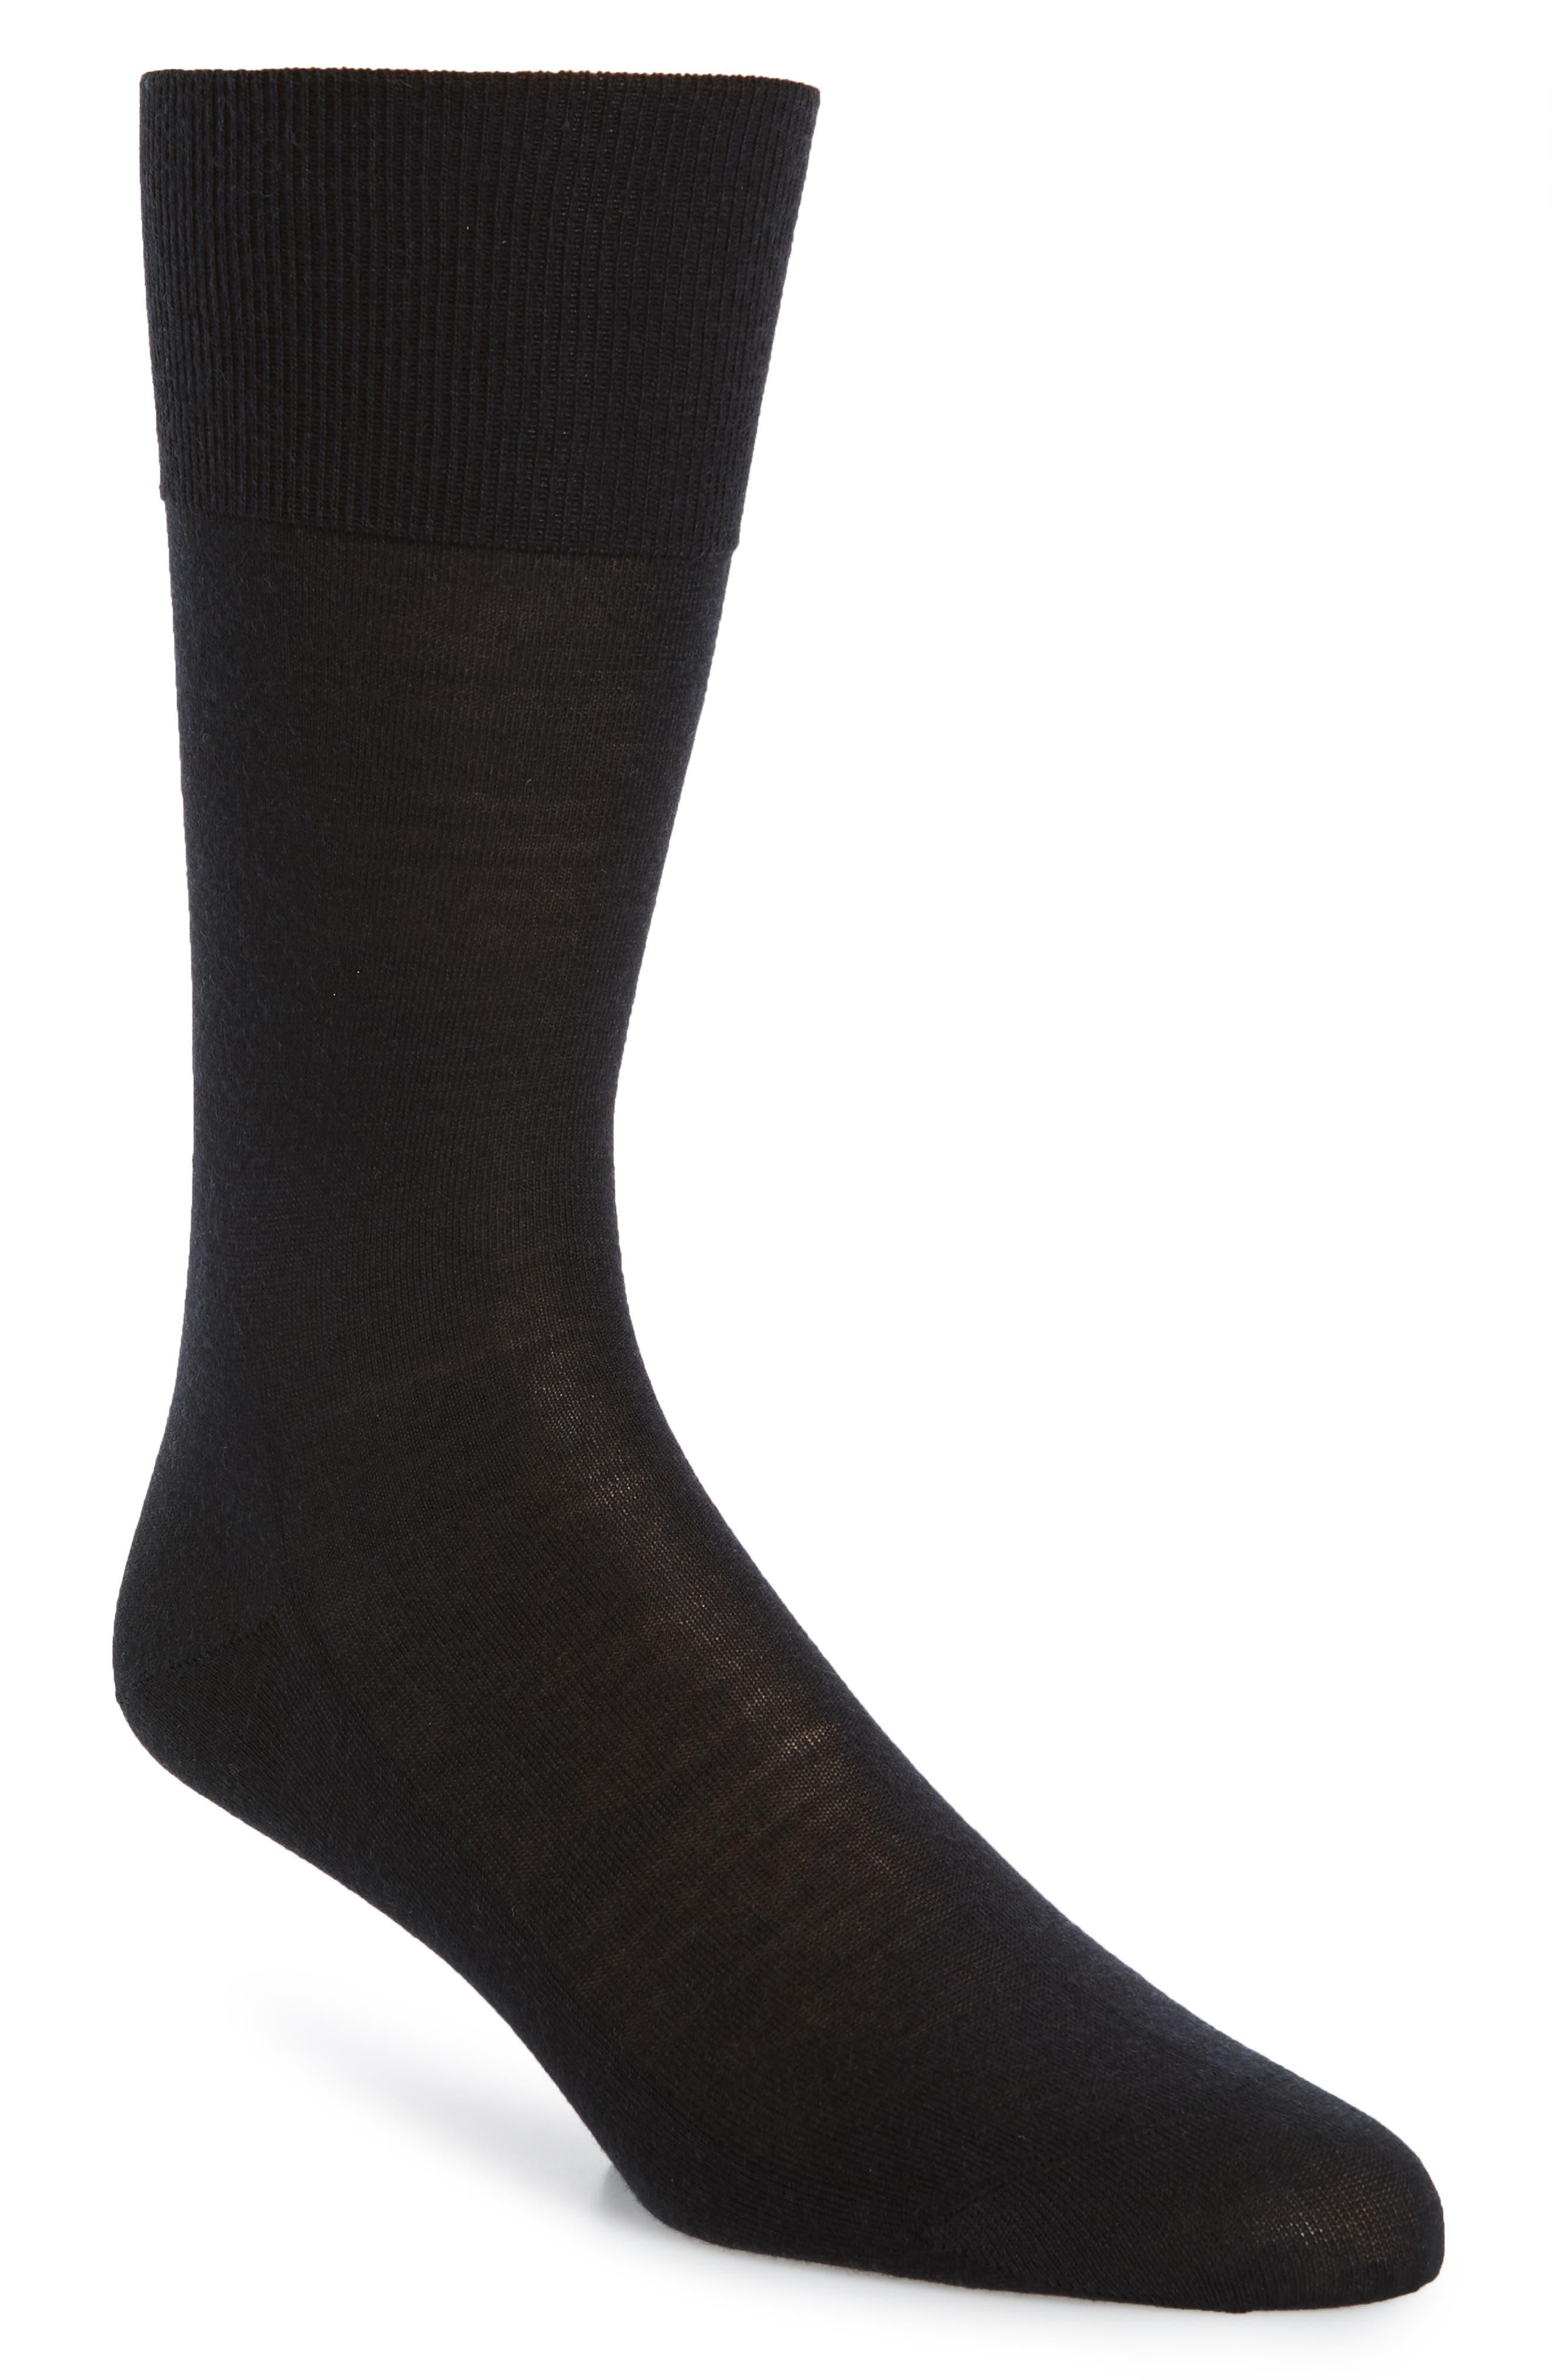 FALKE,                             No. 6 Merino Wool Blend Socks,                             Main thumbnail 1, color,                             BLACK